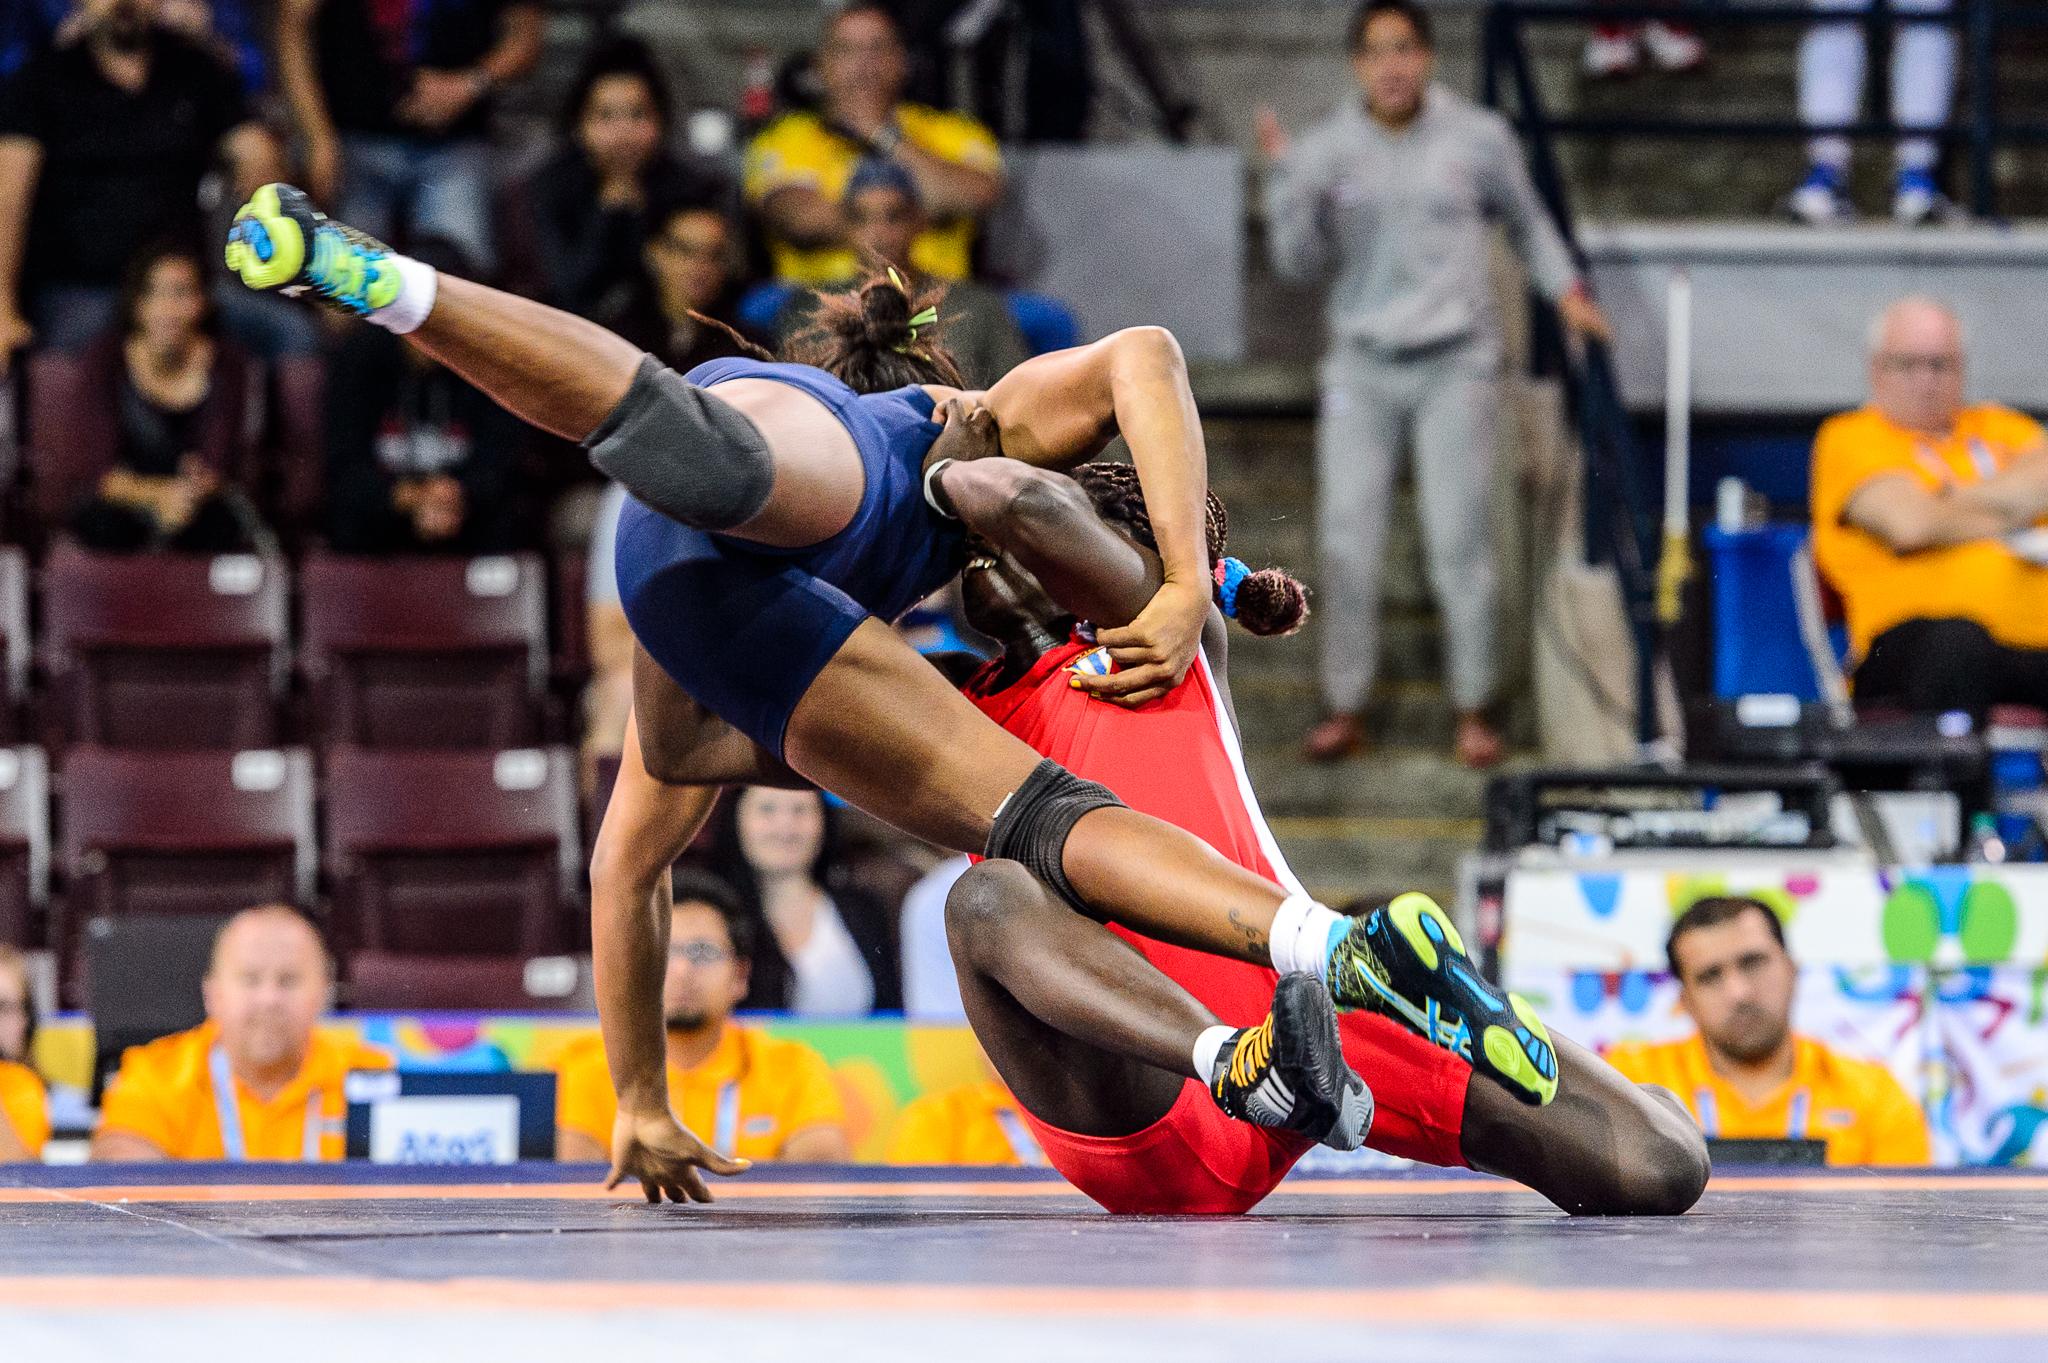 pan american games 2016 wrestling